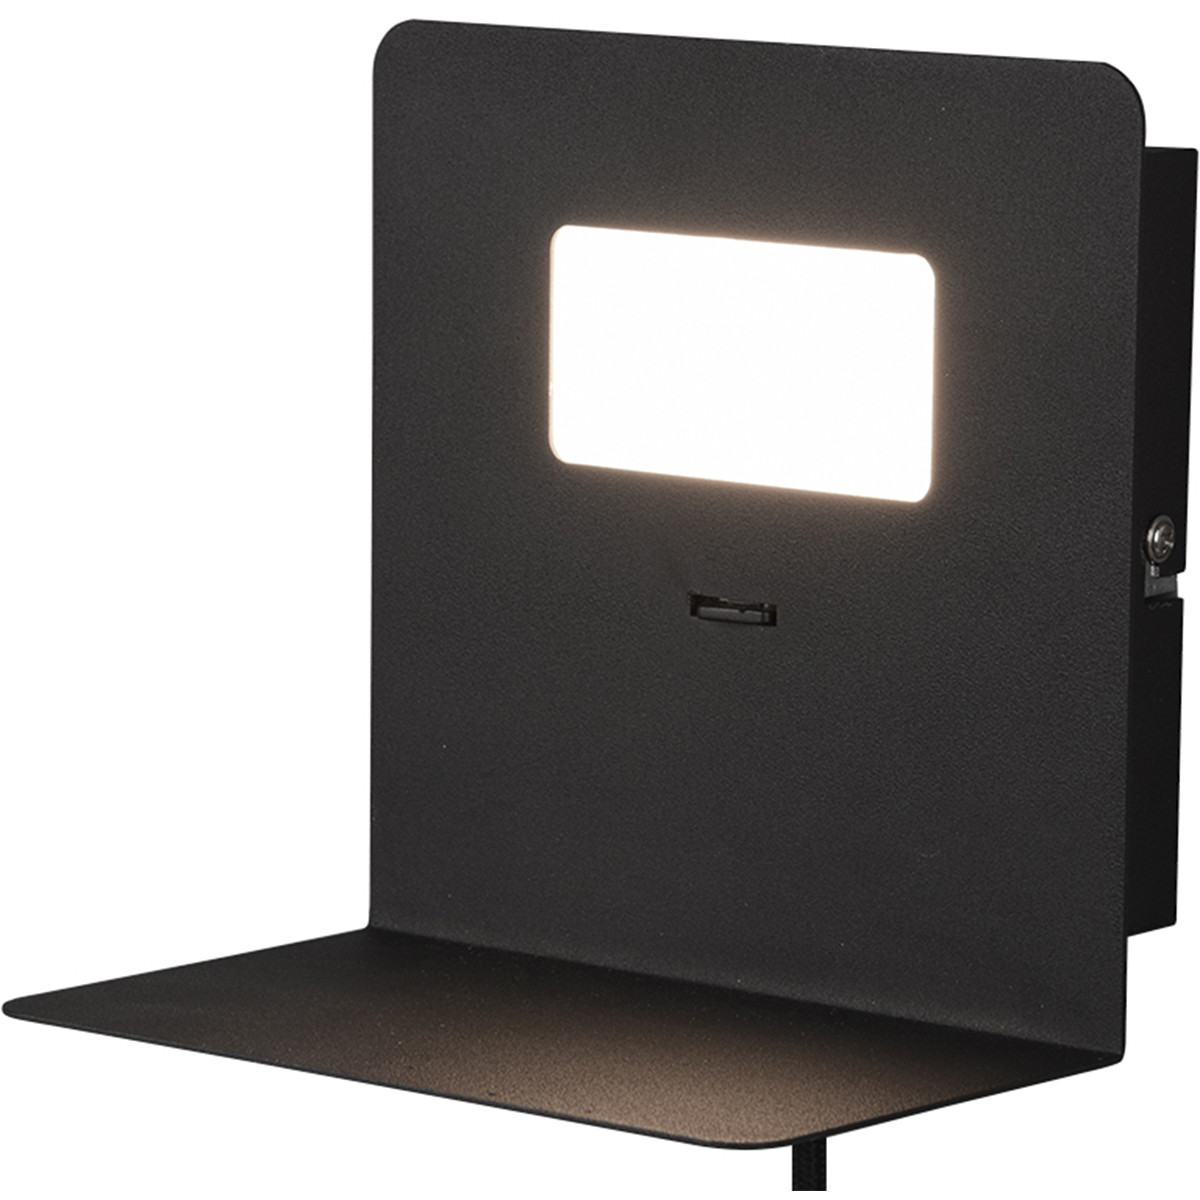 LED Wandlamp - Trion Alinoft - 3W - Warm Wit 3000K - USB Oplaadfunctie - Mat Zwart - Aluminium